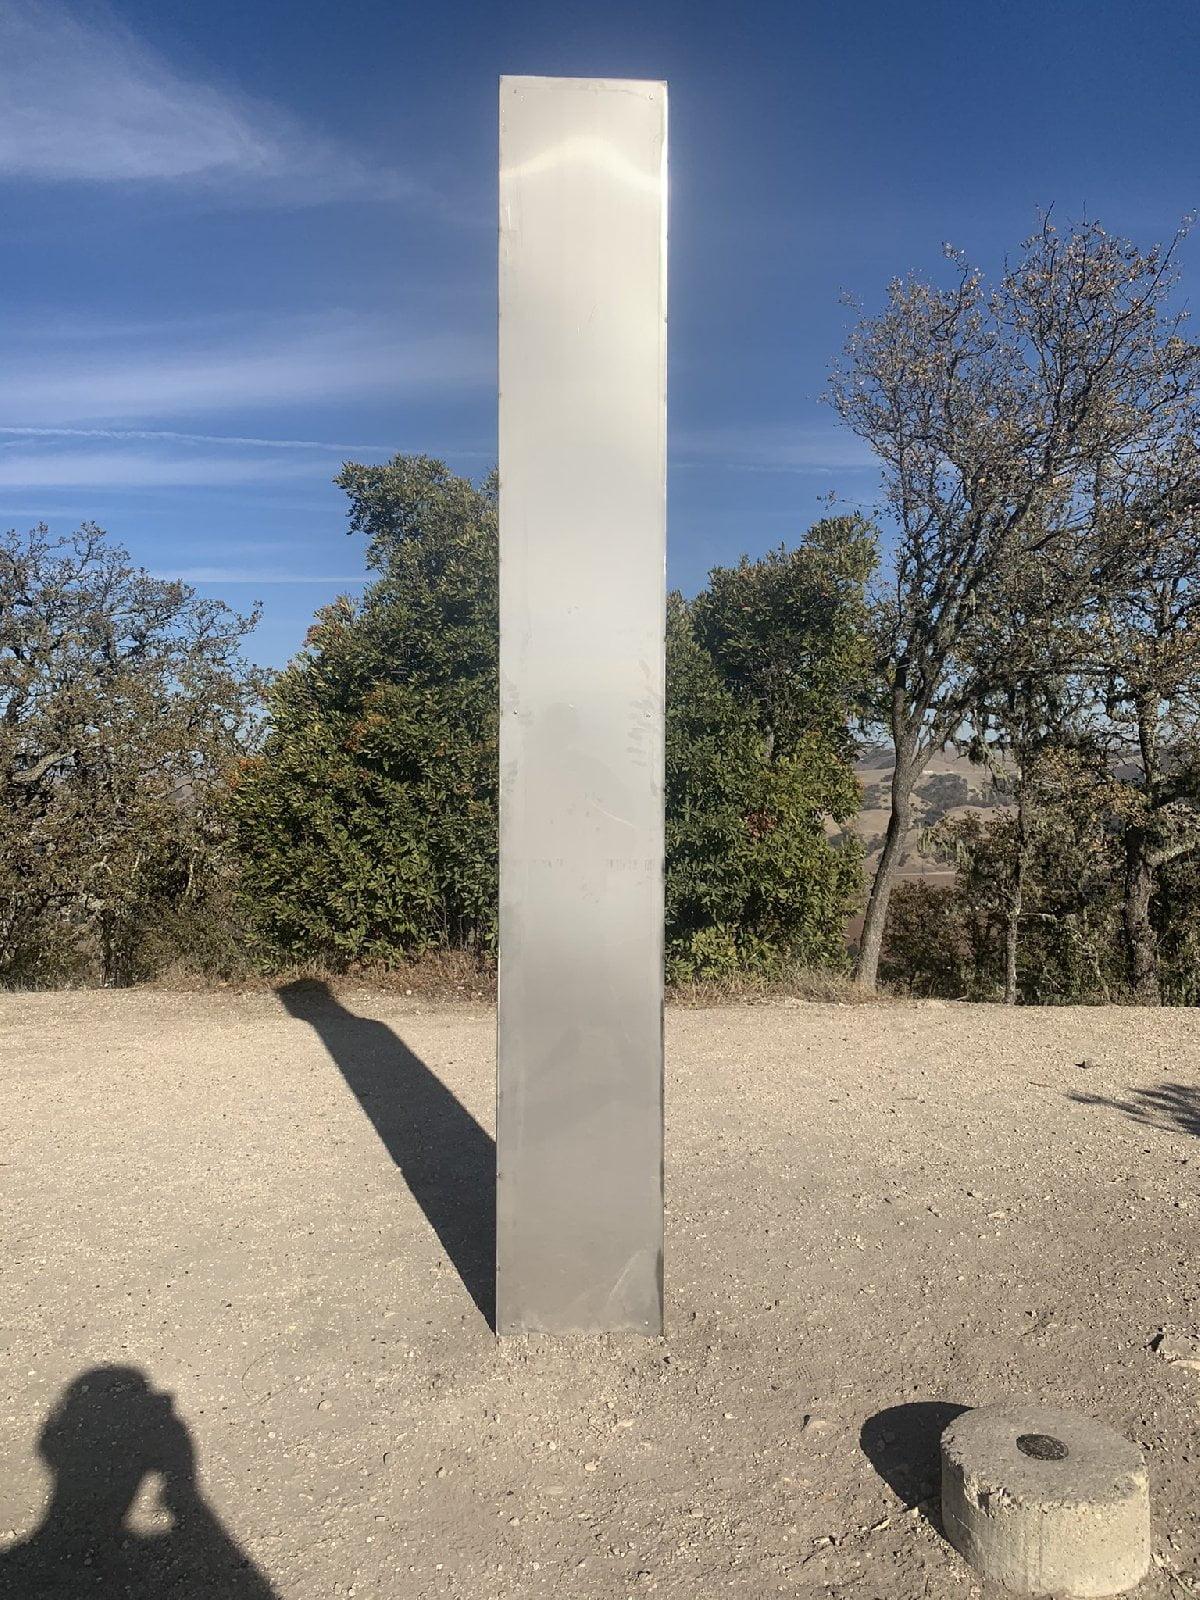 California'daki monolit.